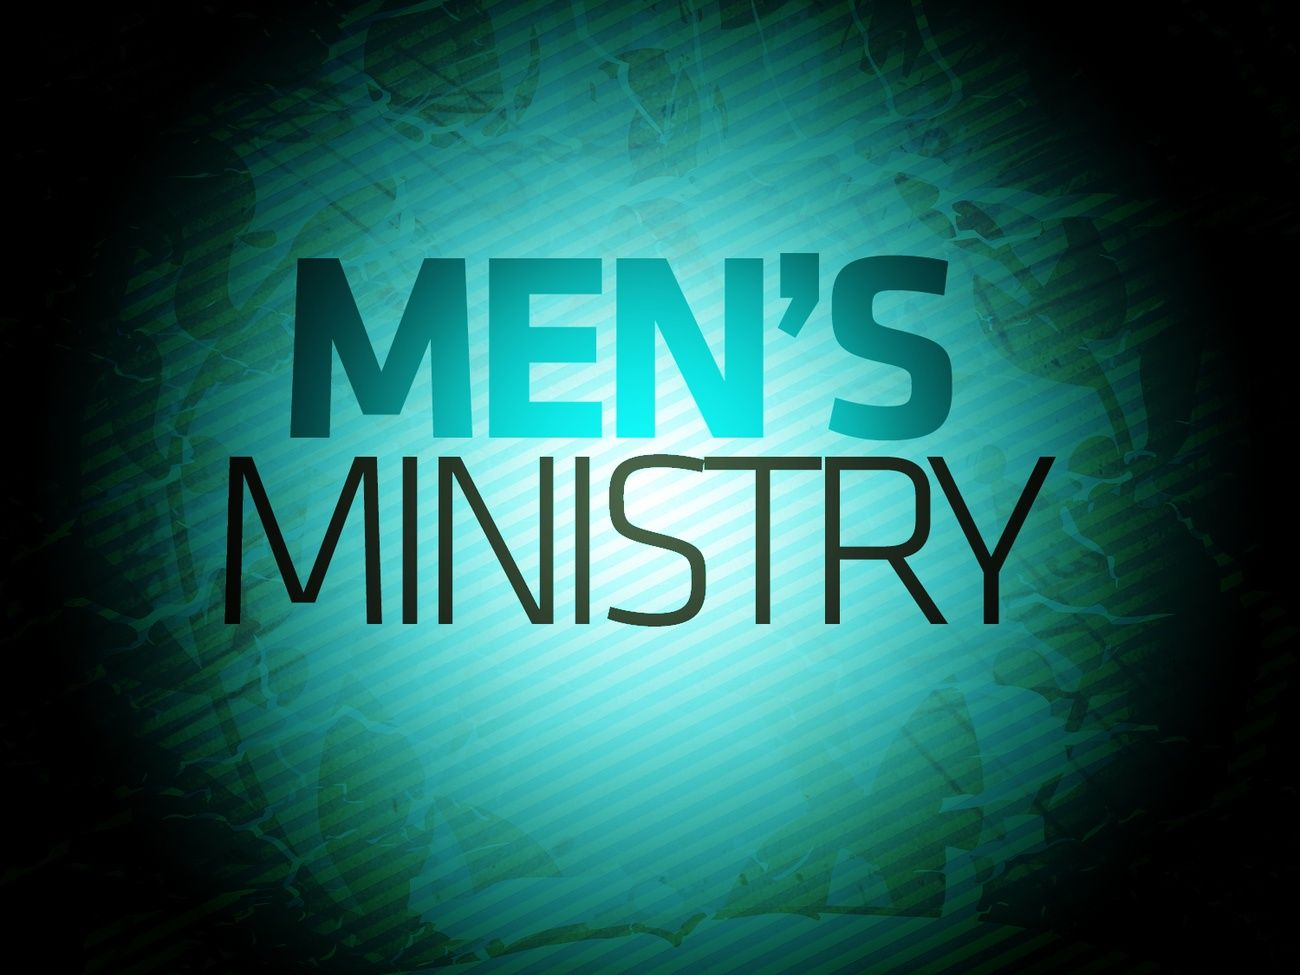 mens ministry | men's ministry | pinterest | mens ministry, ministry